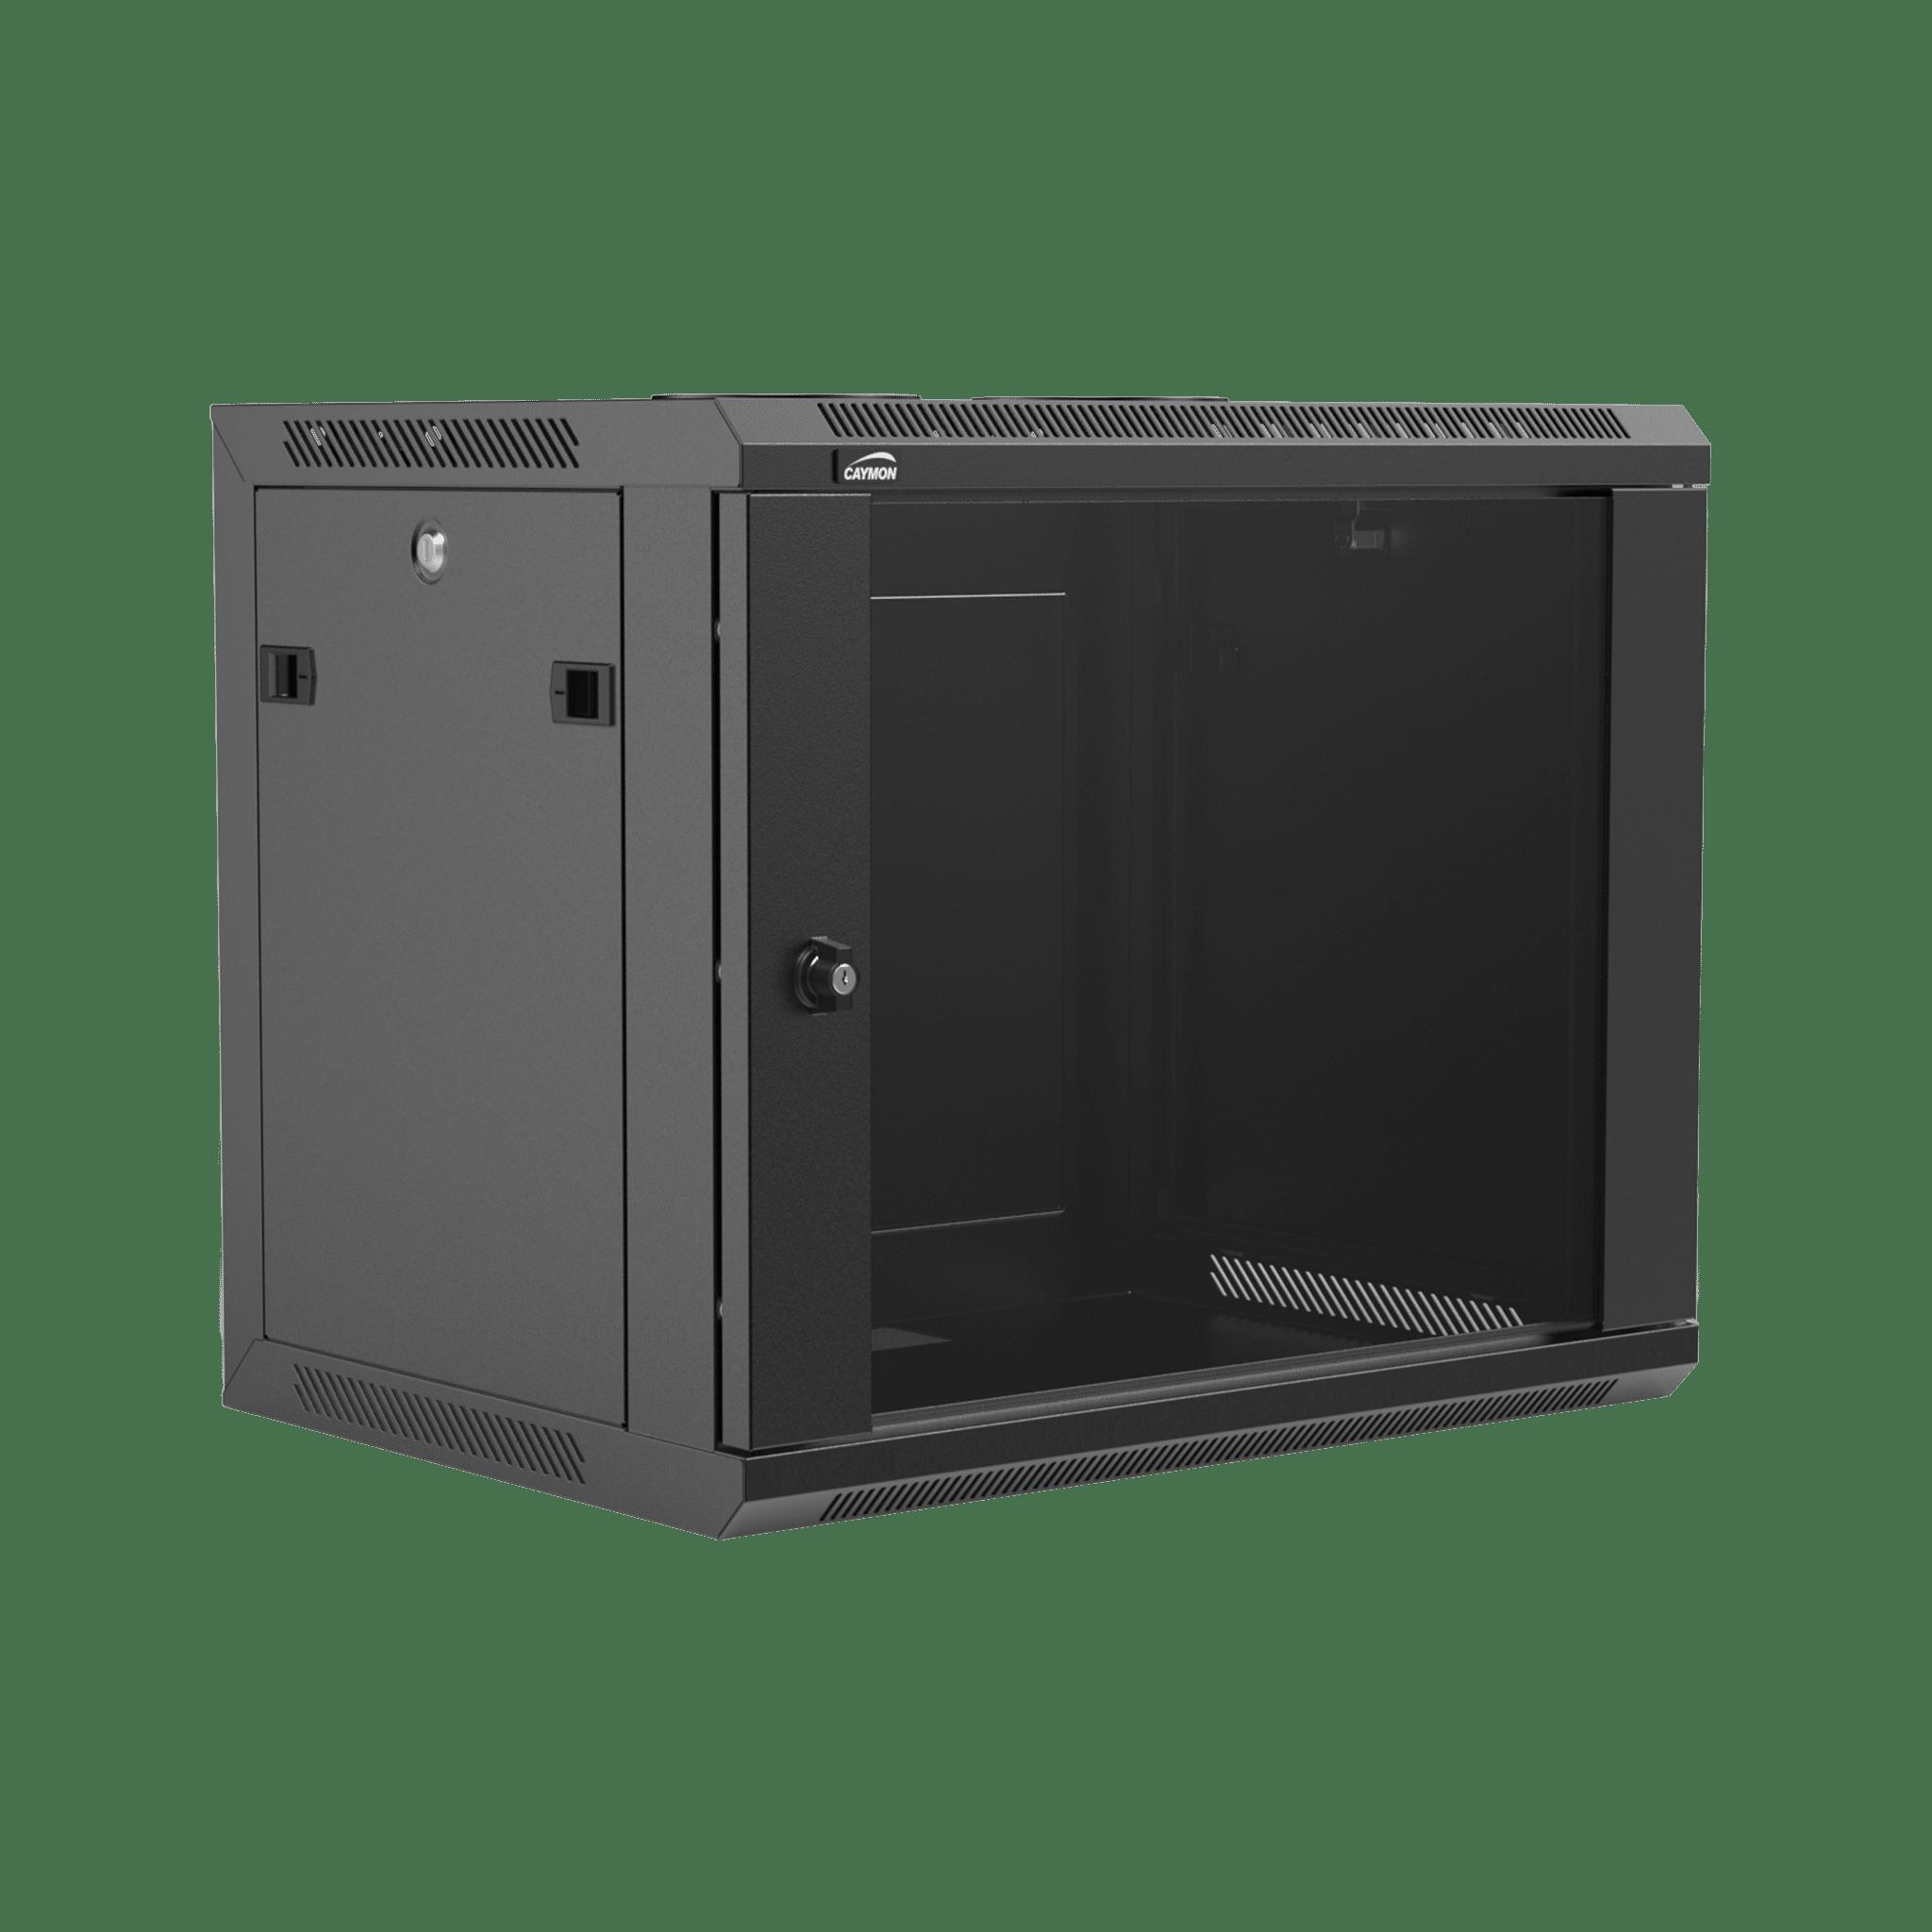 "WPR409R - 19"" wall mount rack - 9 units - 450mm depth - Removable back"